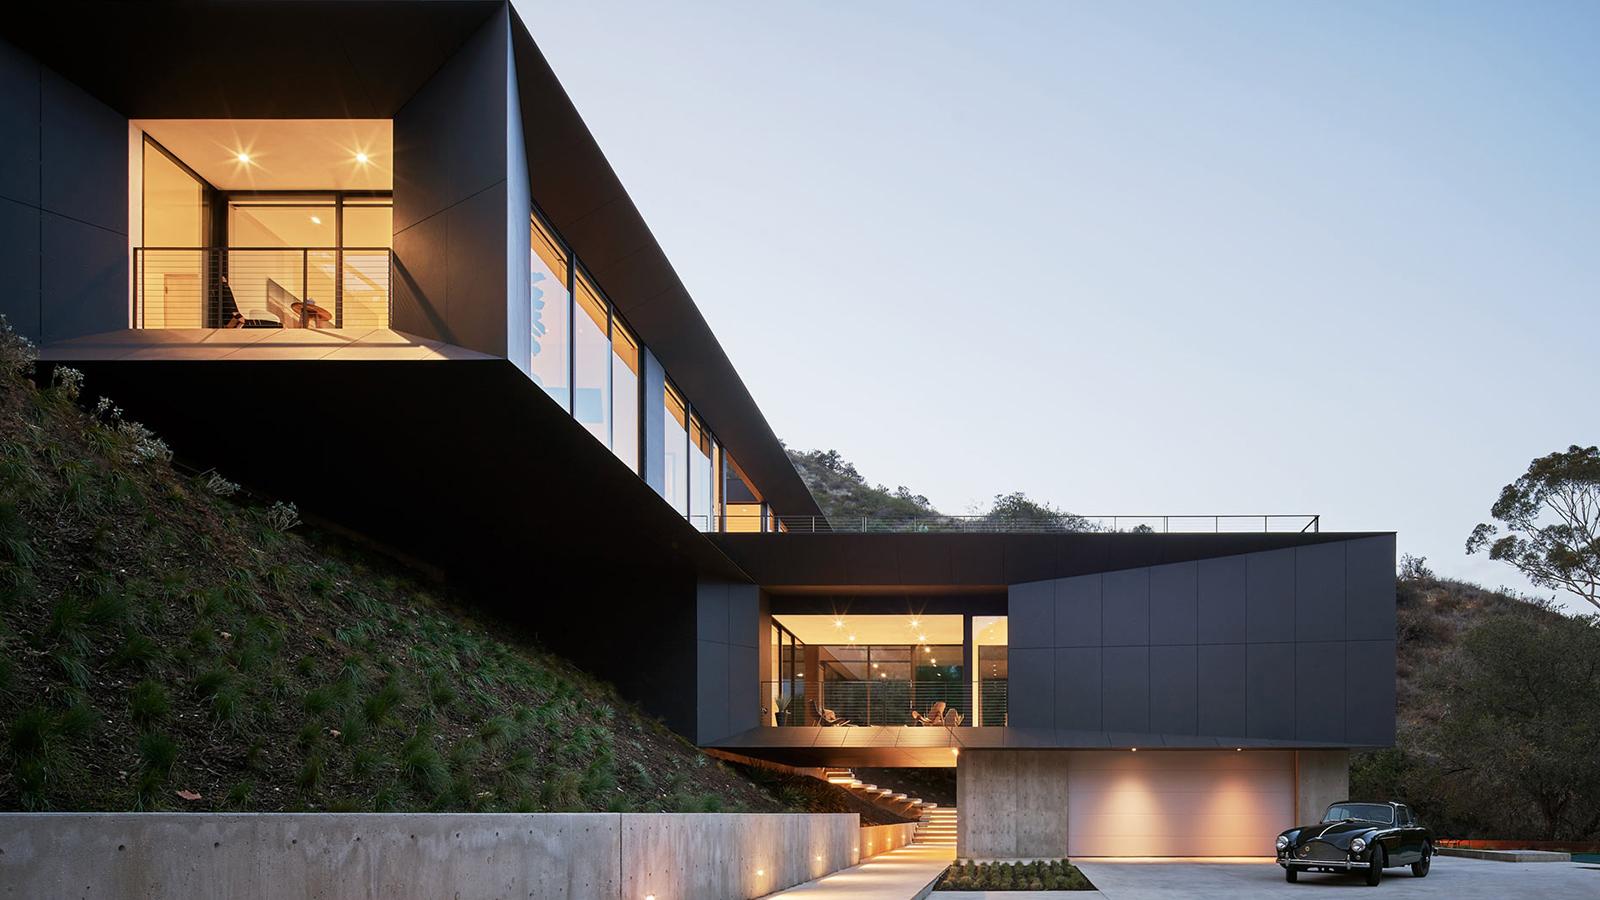 LR2 Residence by Montalba Architects